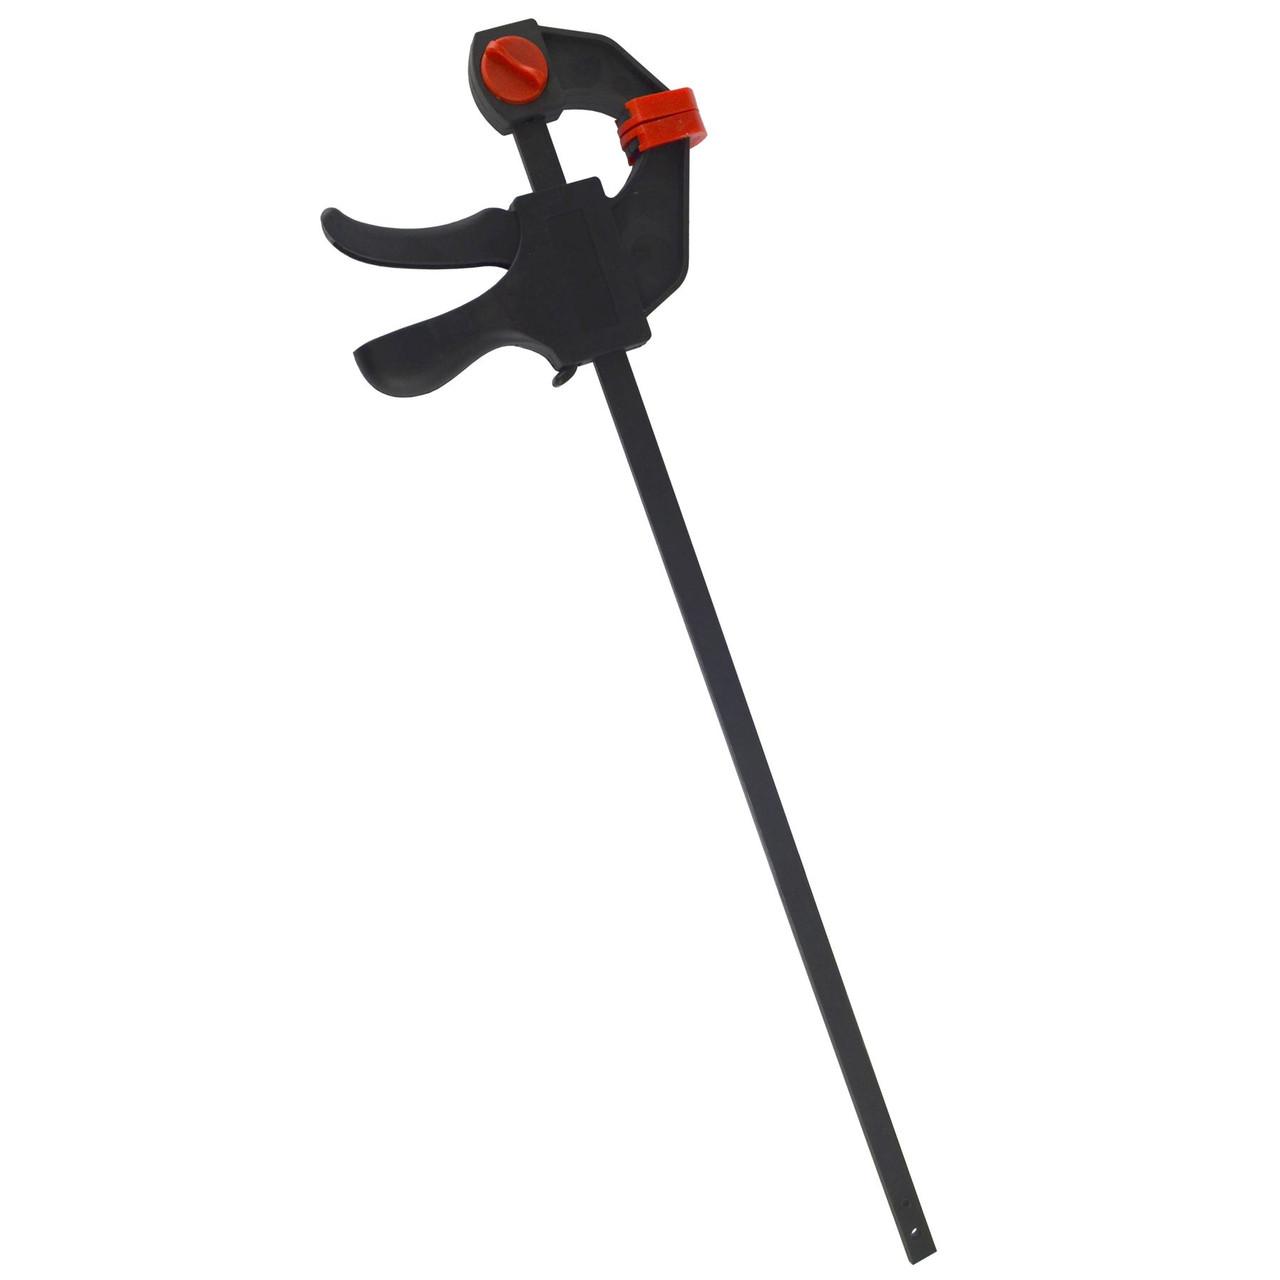 "18"" Rapid Quick Ratchet Bar Clamp Spreader Grip Holder TE604"